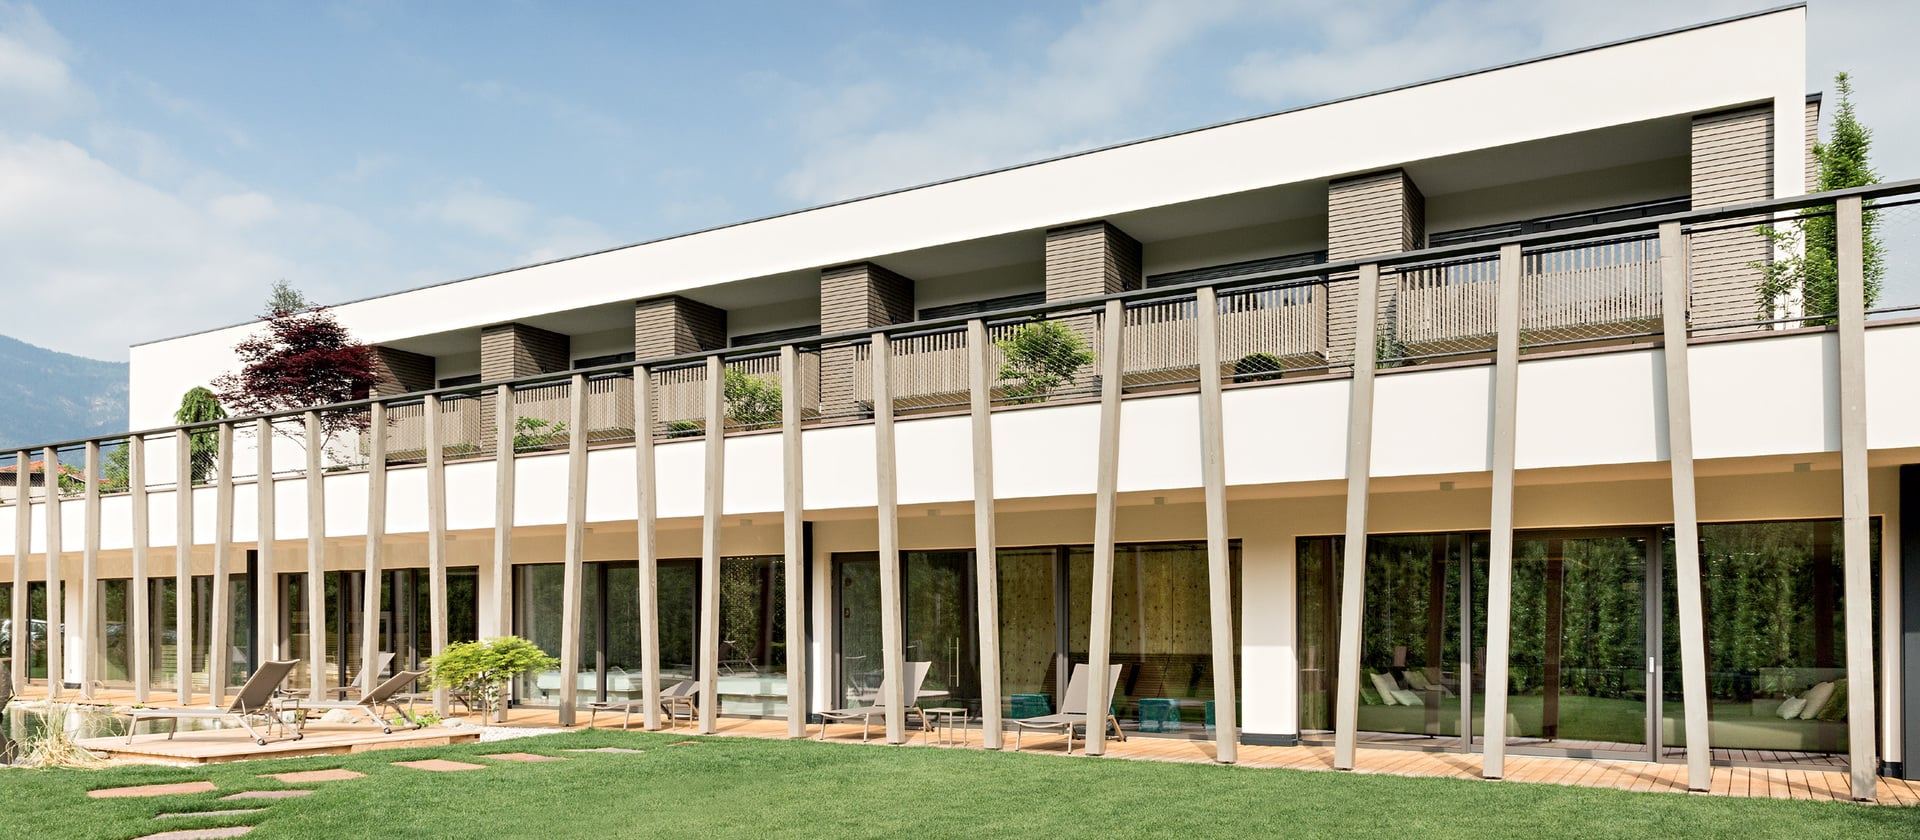 Gartenhotel Moser no lago Montiggler